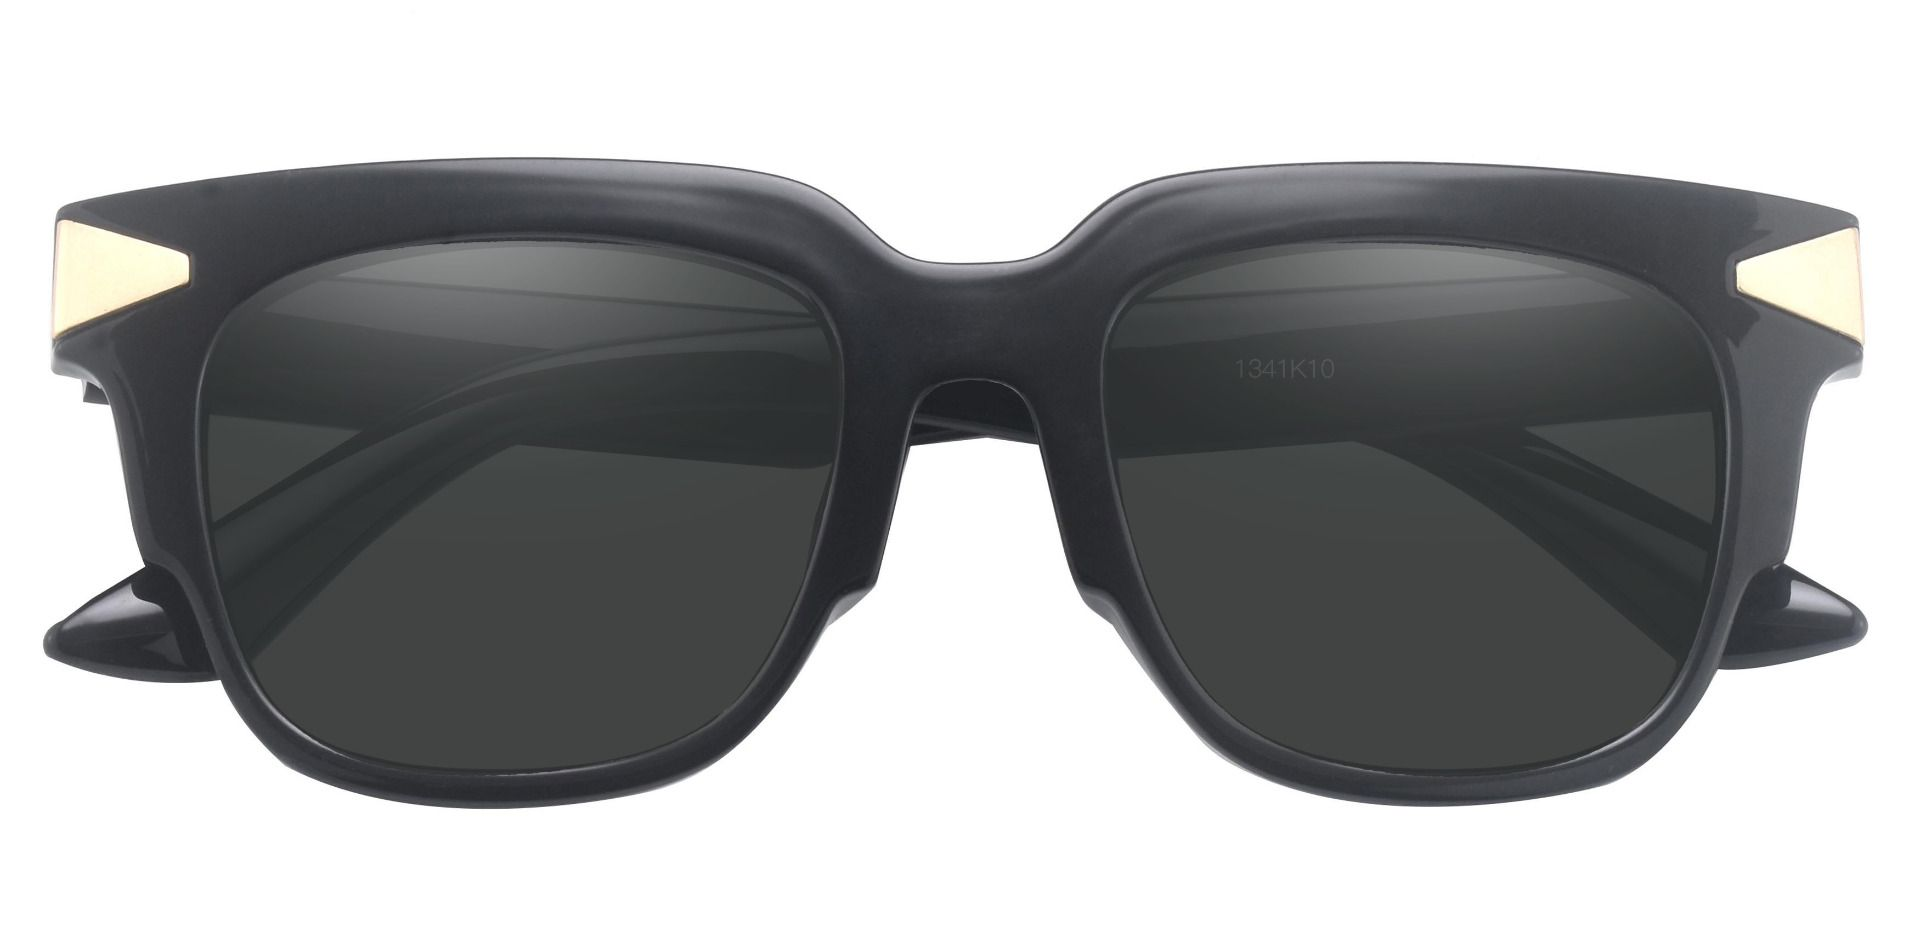 Ardent Square Prescription Sunglasses - Black Frame With Gray Lenses